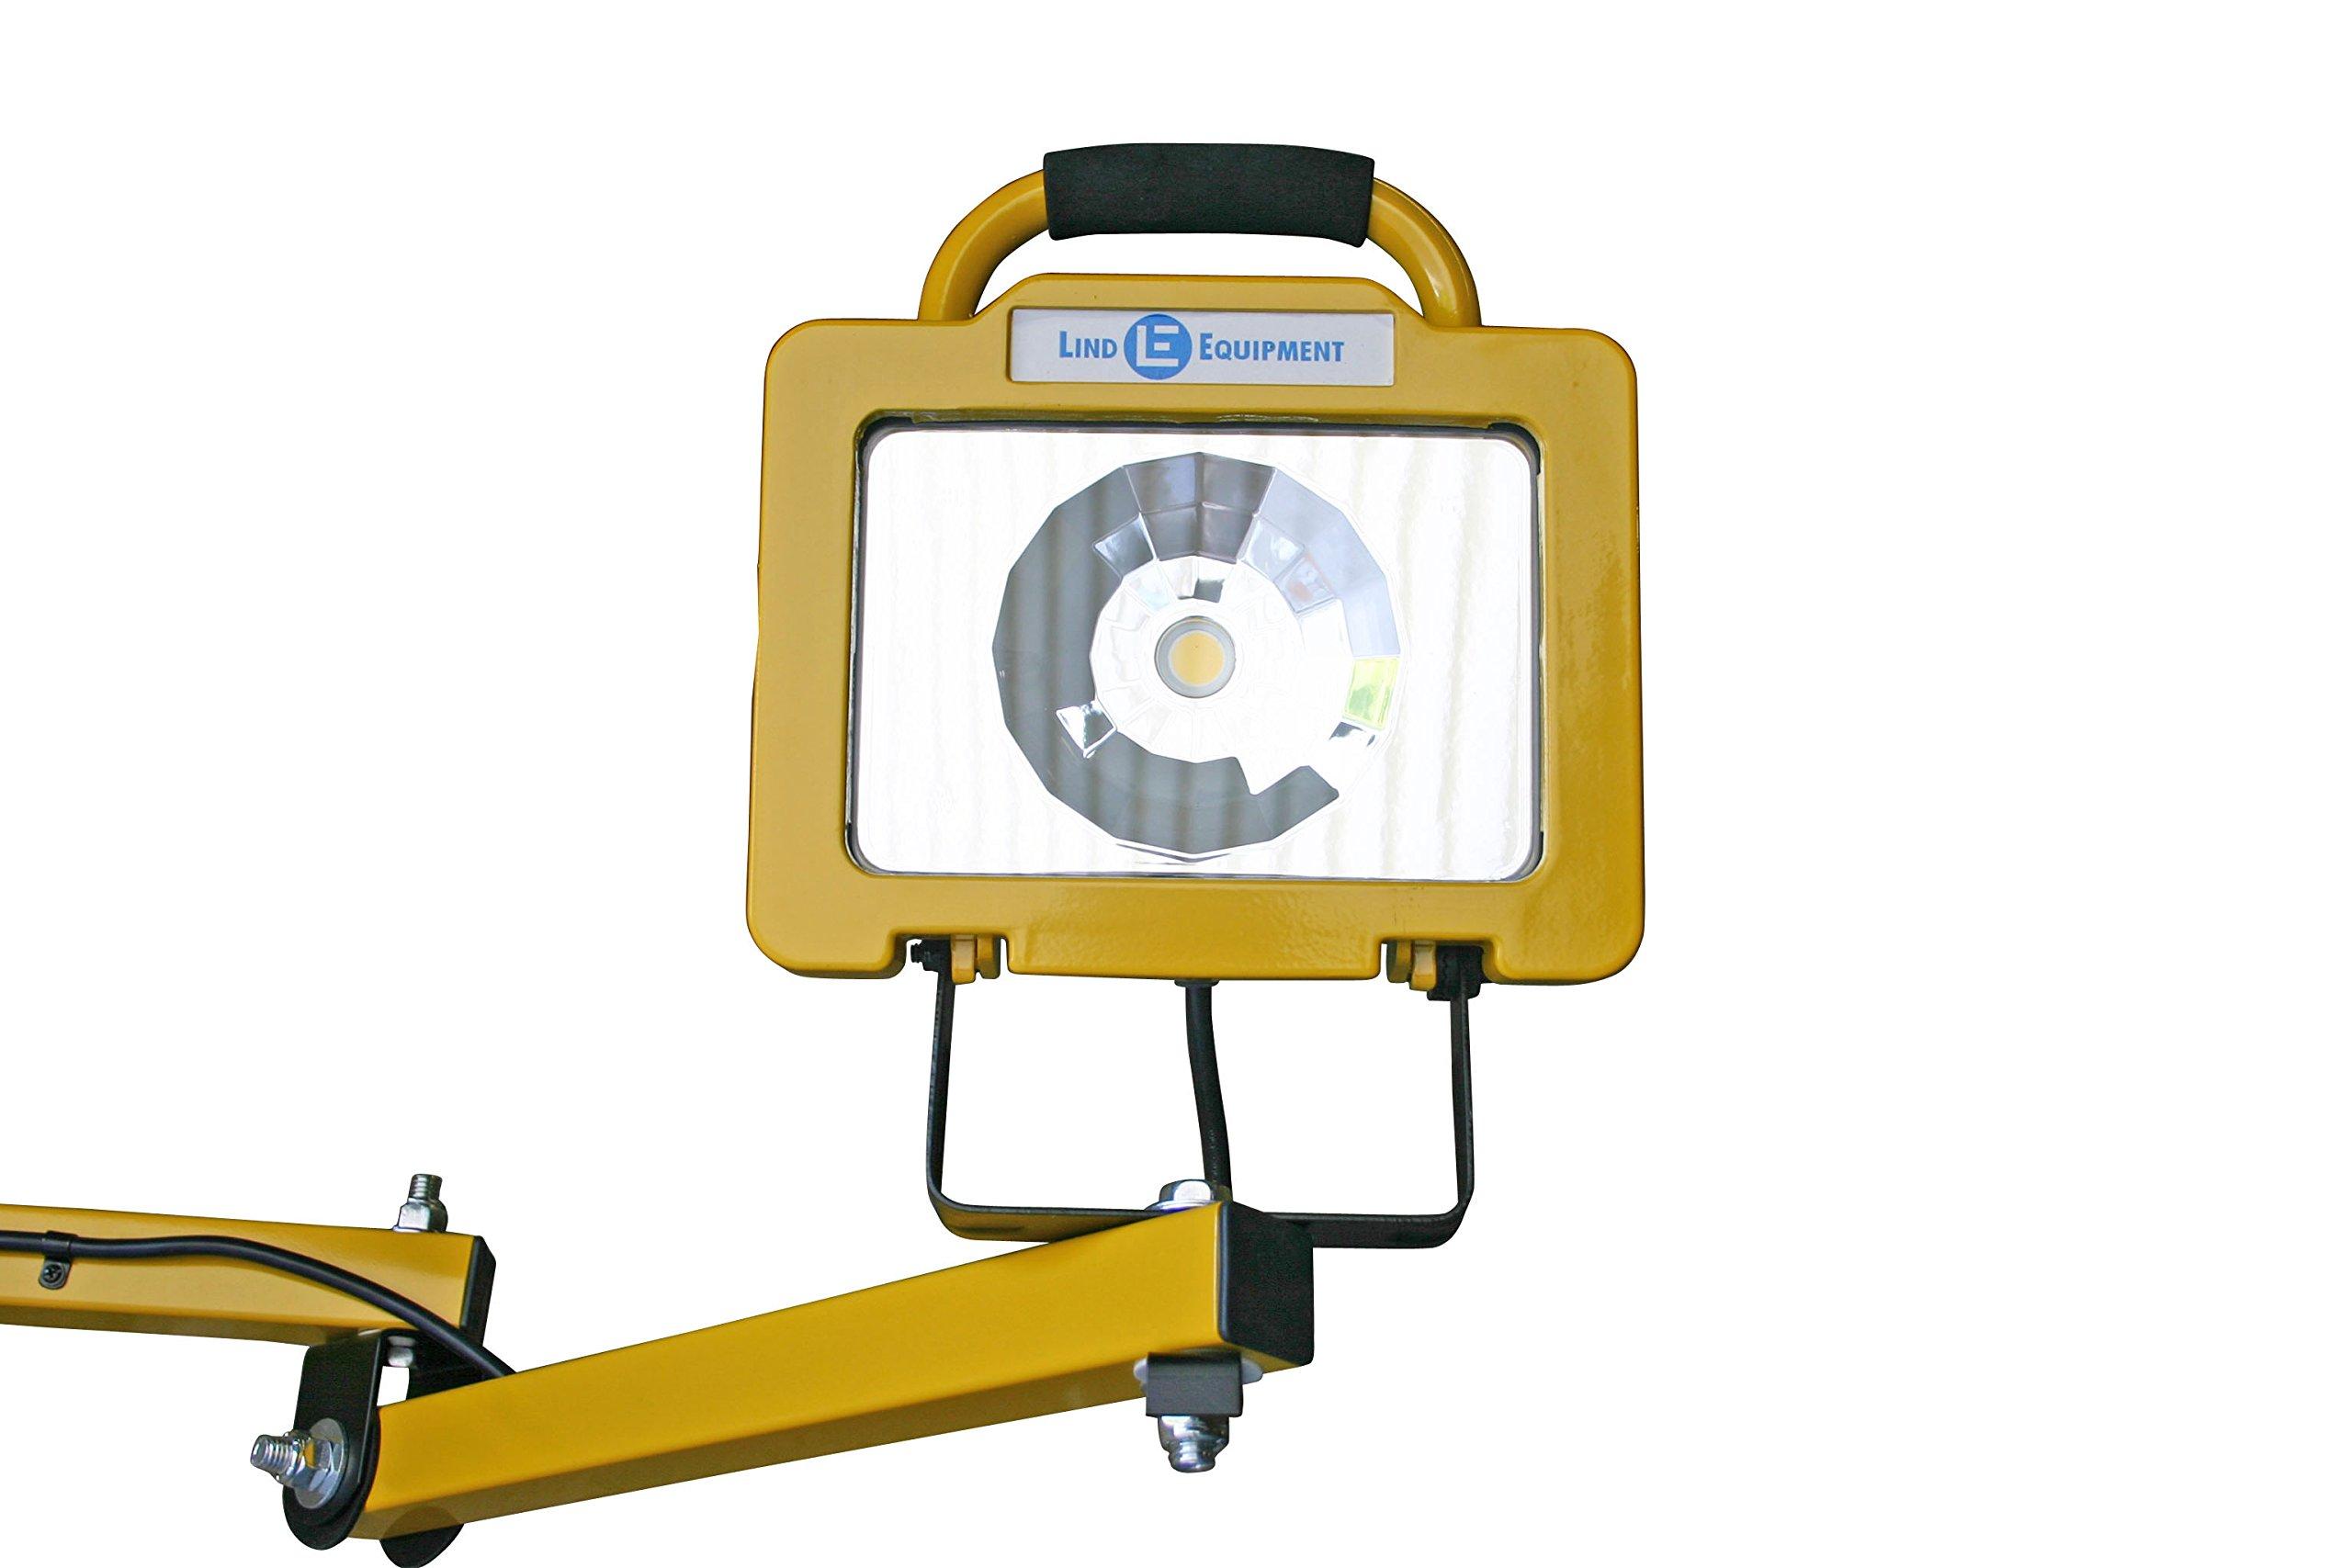 Lind Equipment L41LED Heavy Duty LED Dock Light by Lind Equipment